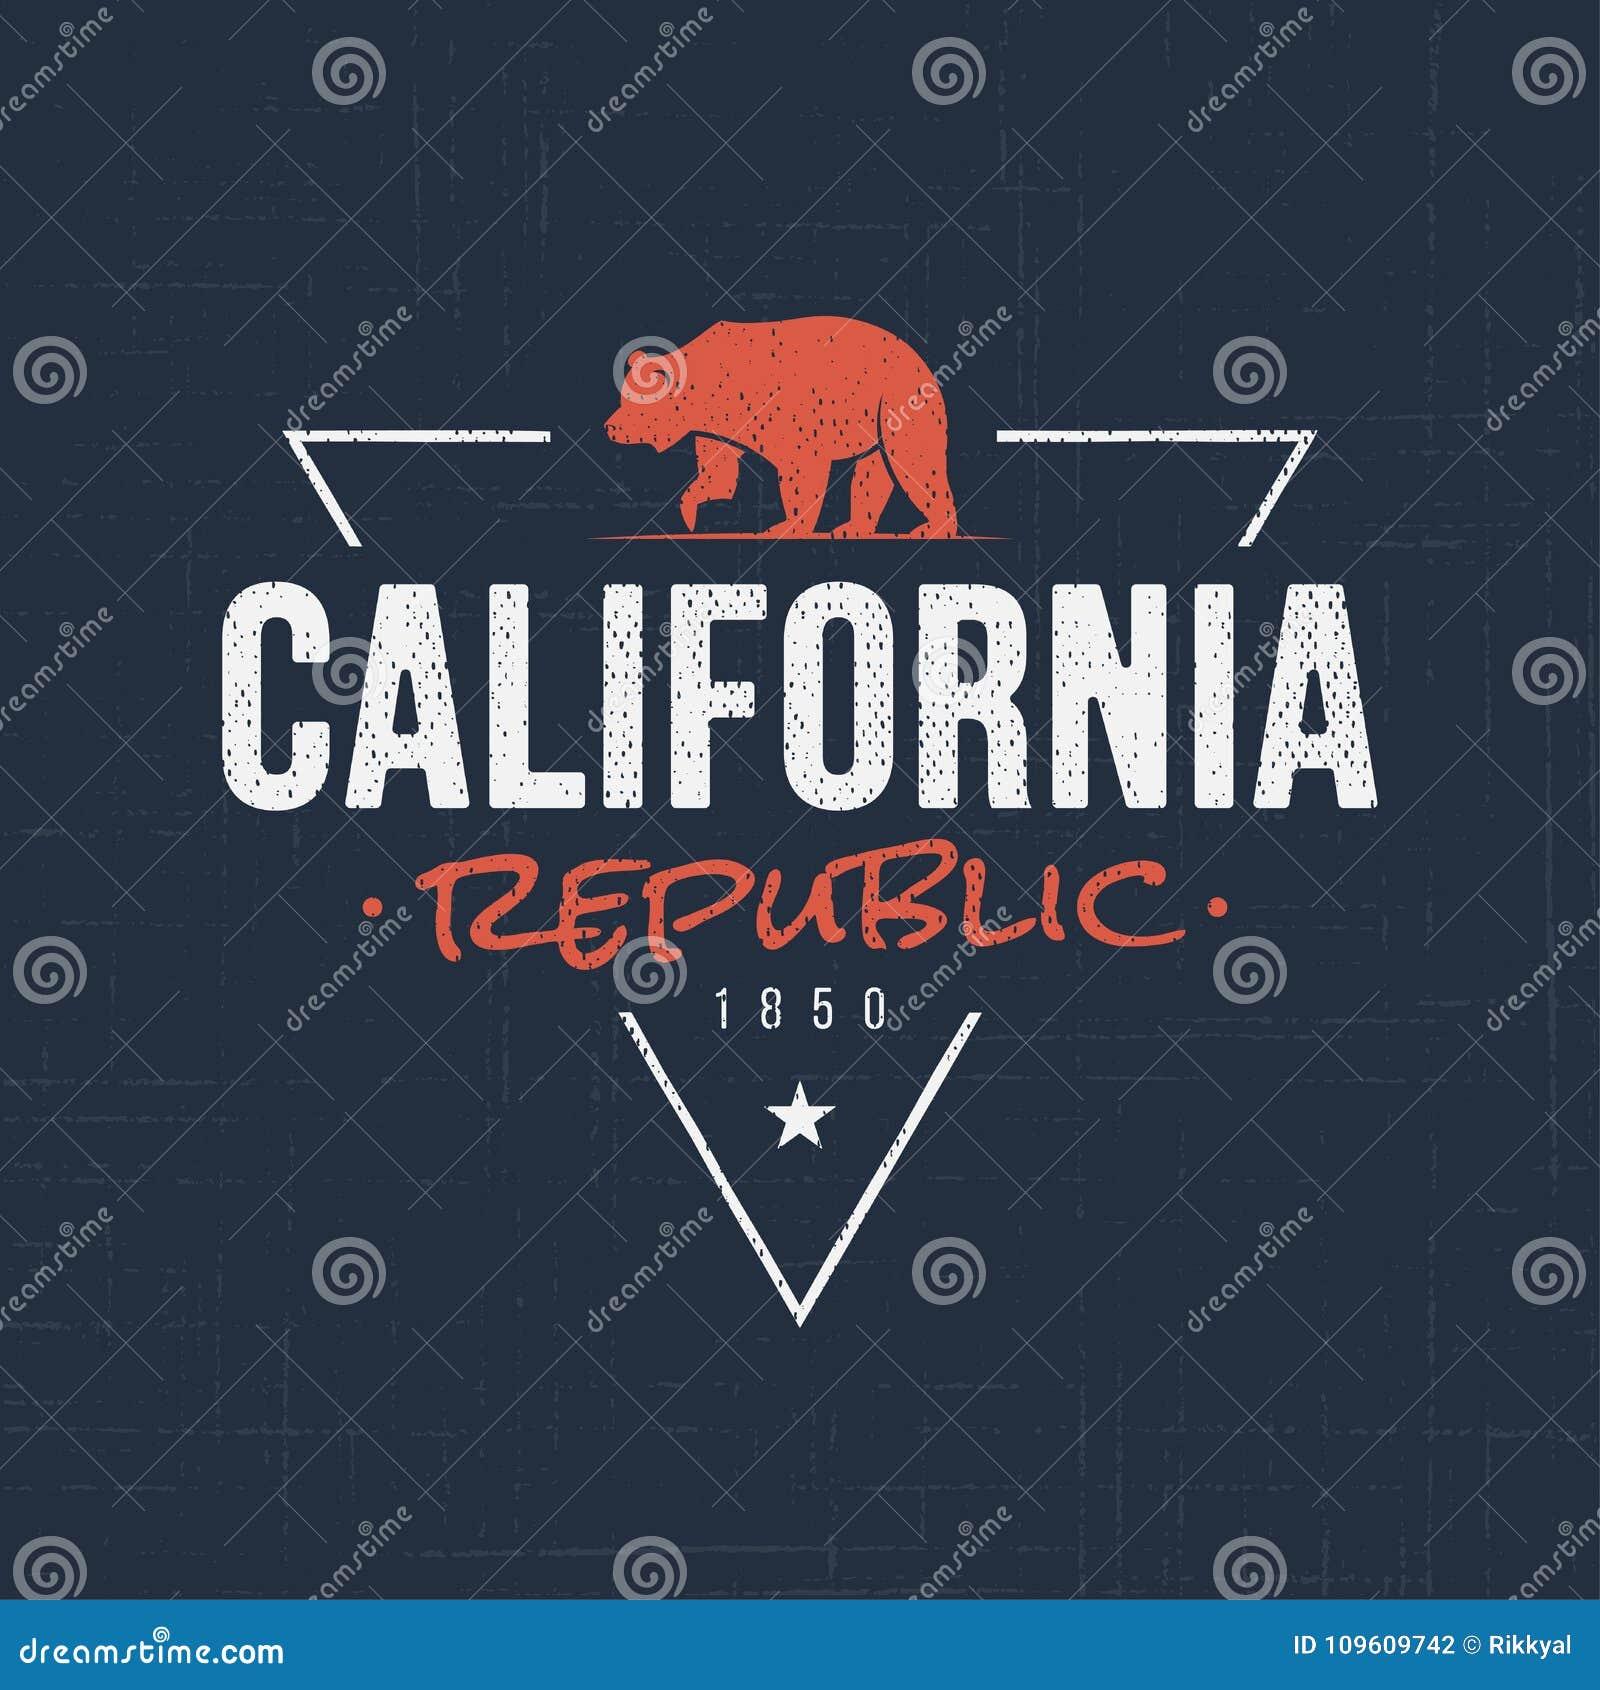 b1312880a California Republic. T-shirt And Apparel Design Stock Vector ...